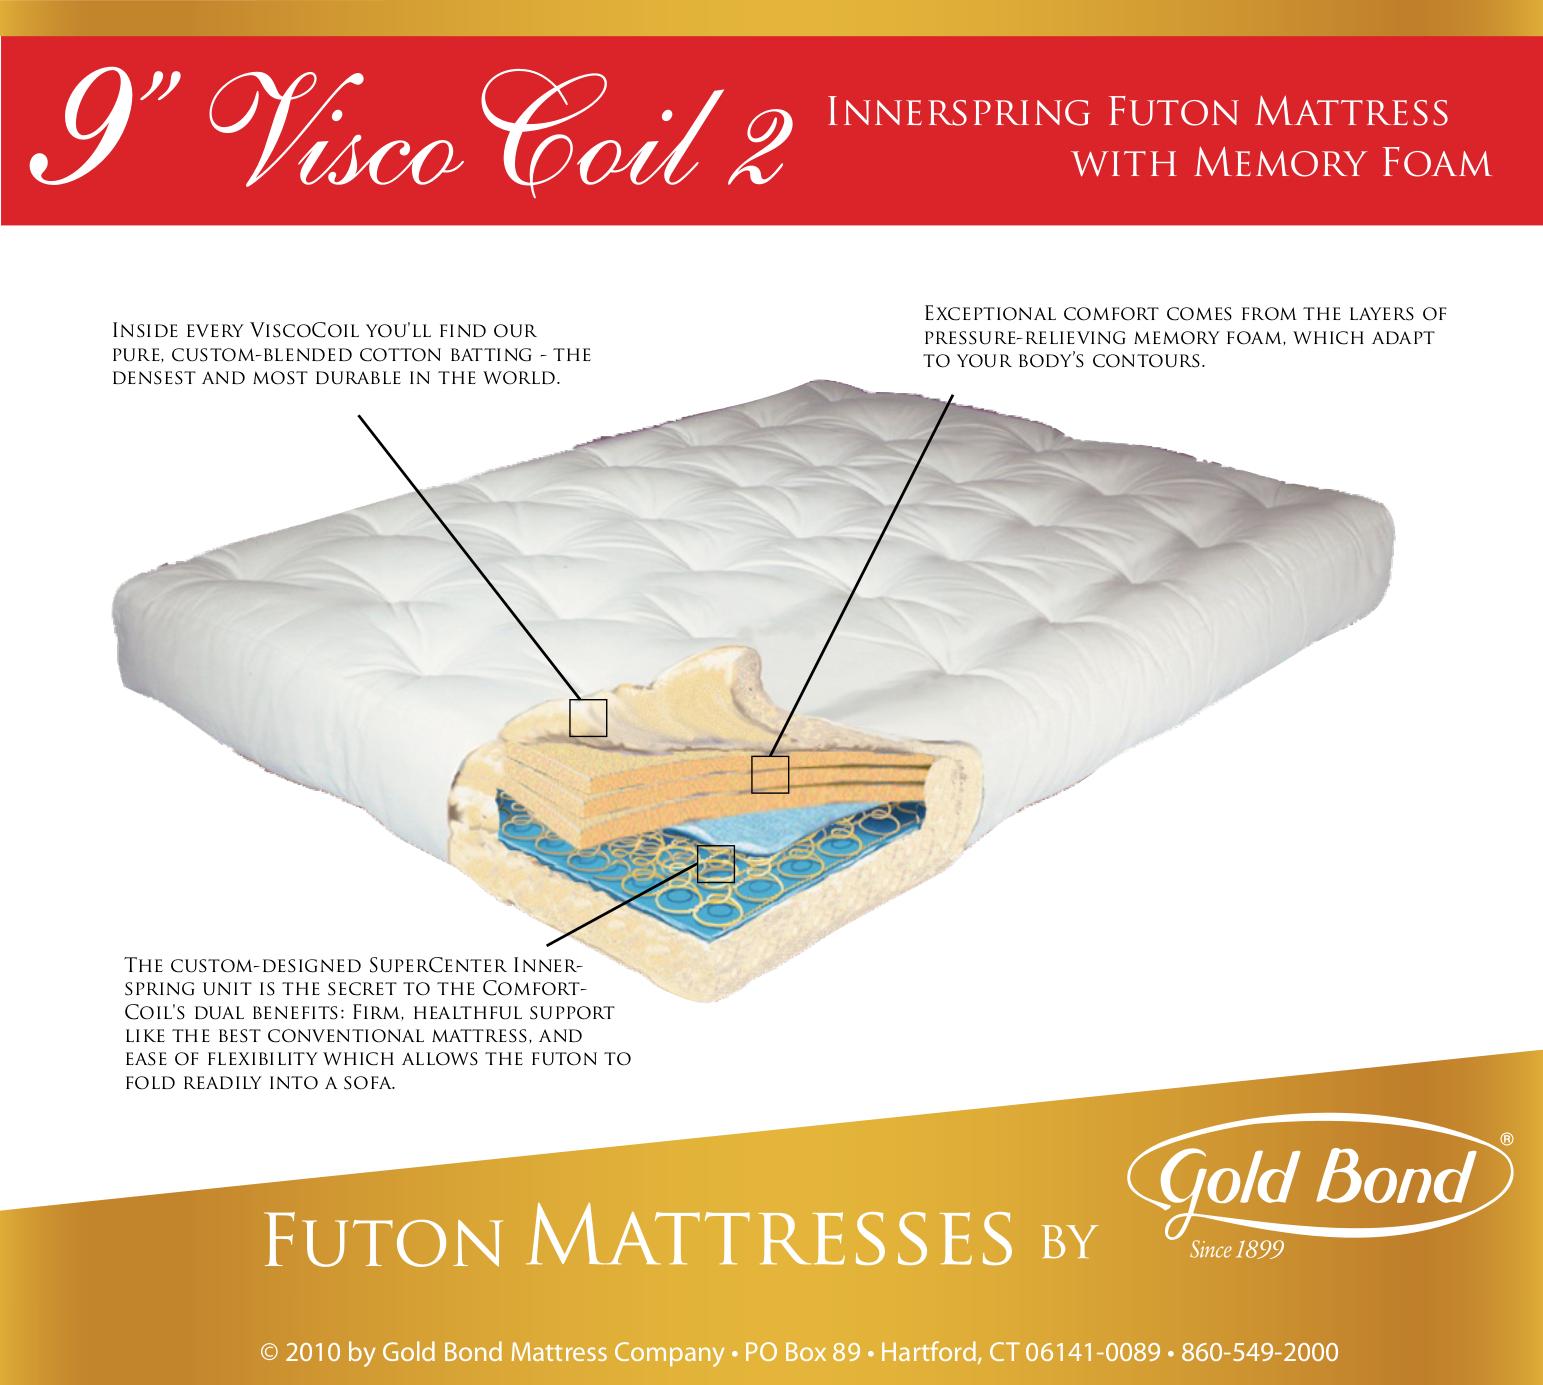 coil seaside night innerspring futon futons day and full mattress xiorex queen pocket